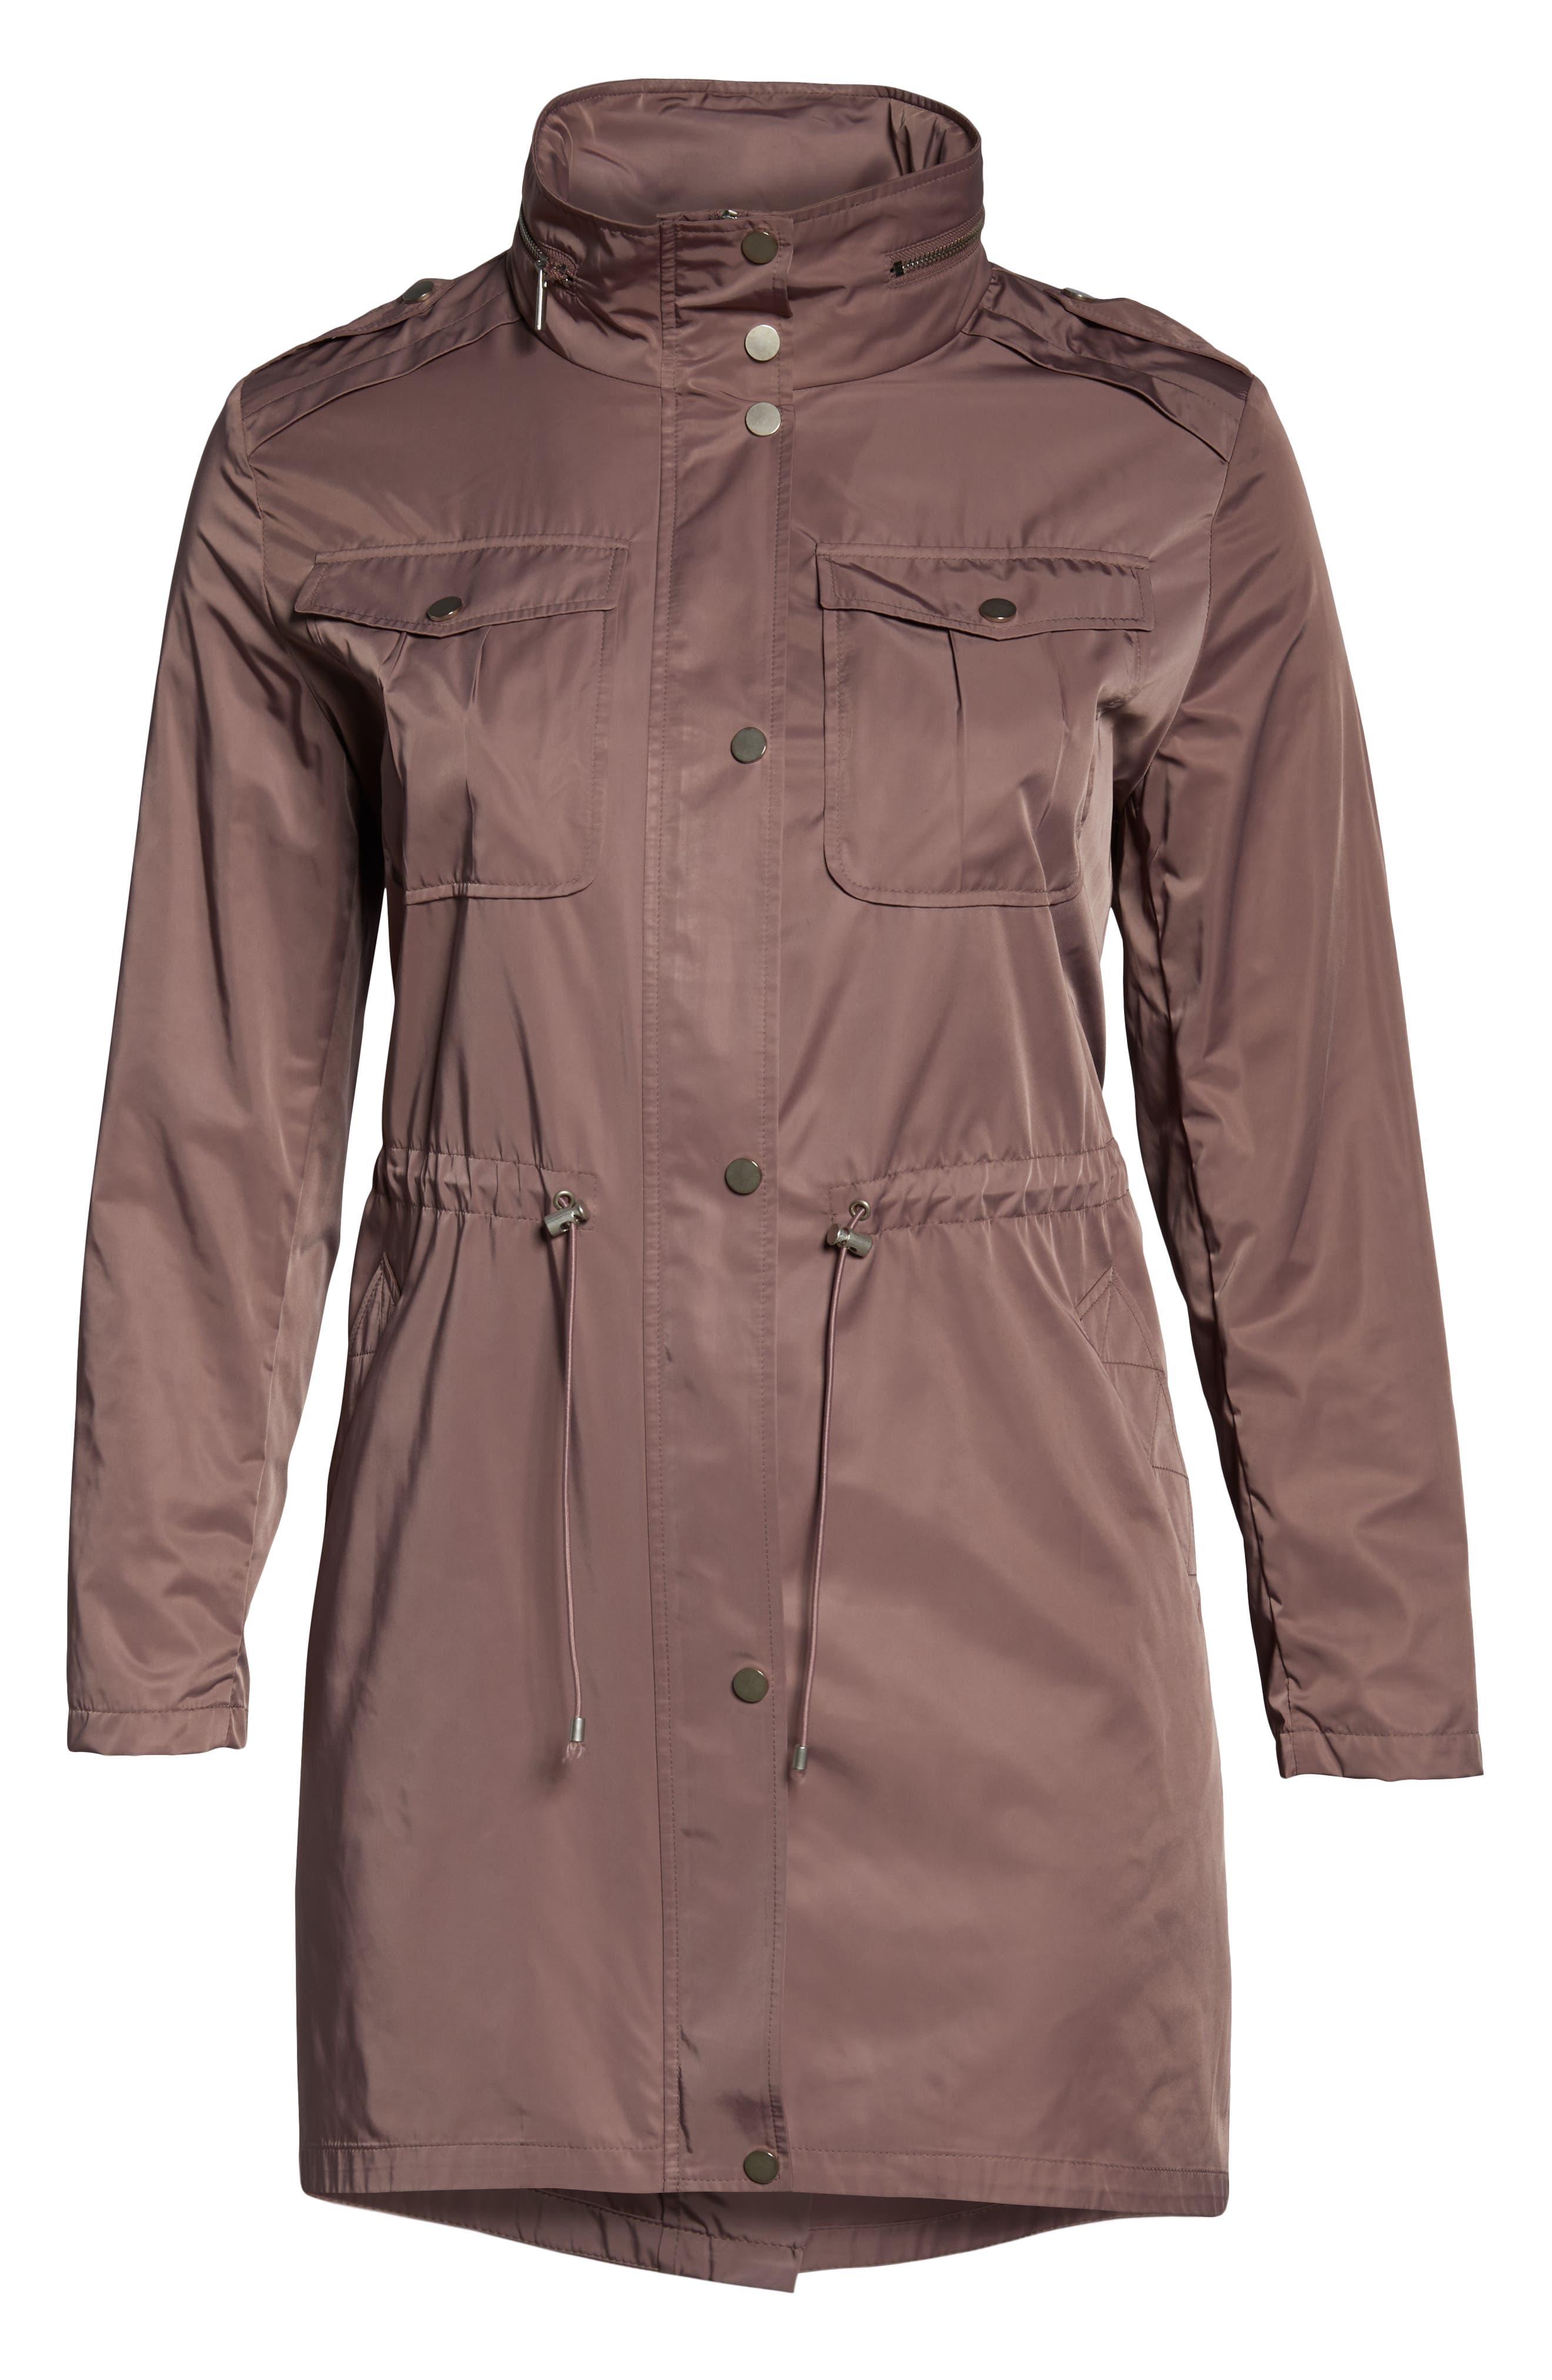 240b4a5513e Women s Badgley Mischka Collection Rain Coats   Jackets